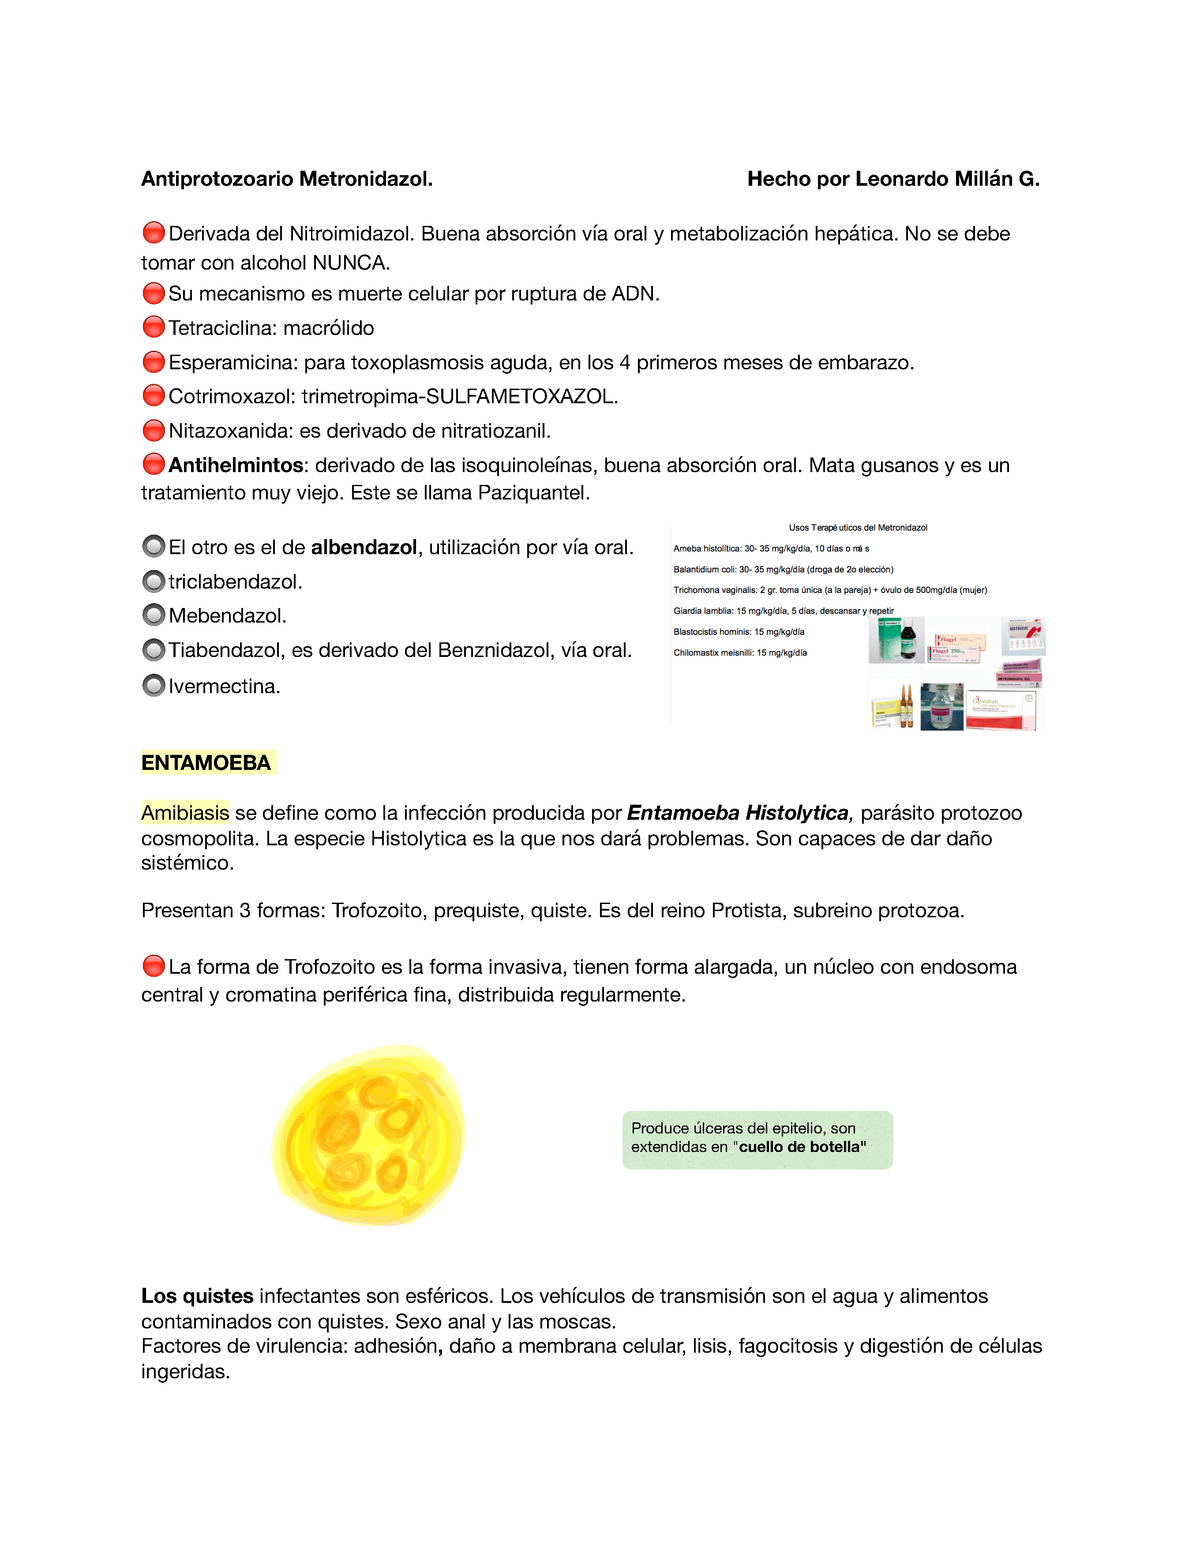 Piroplasme şi piroplasmoze - Constantin C. Cernăianu - Google Книги